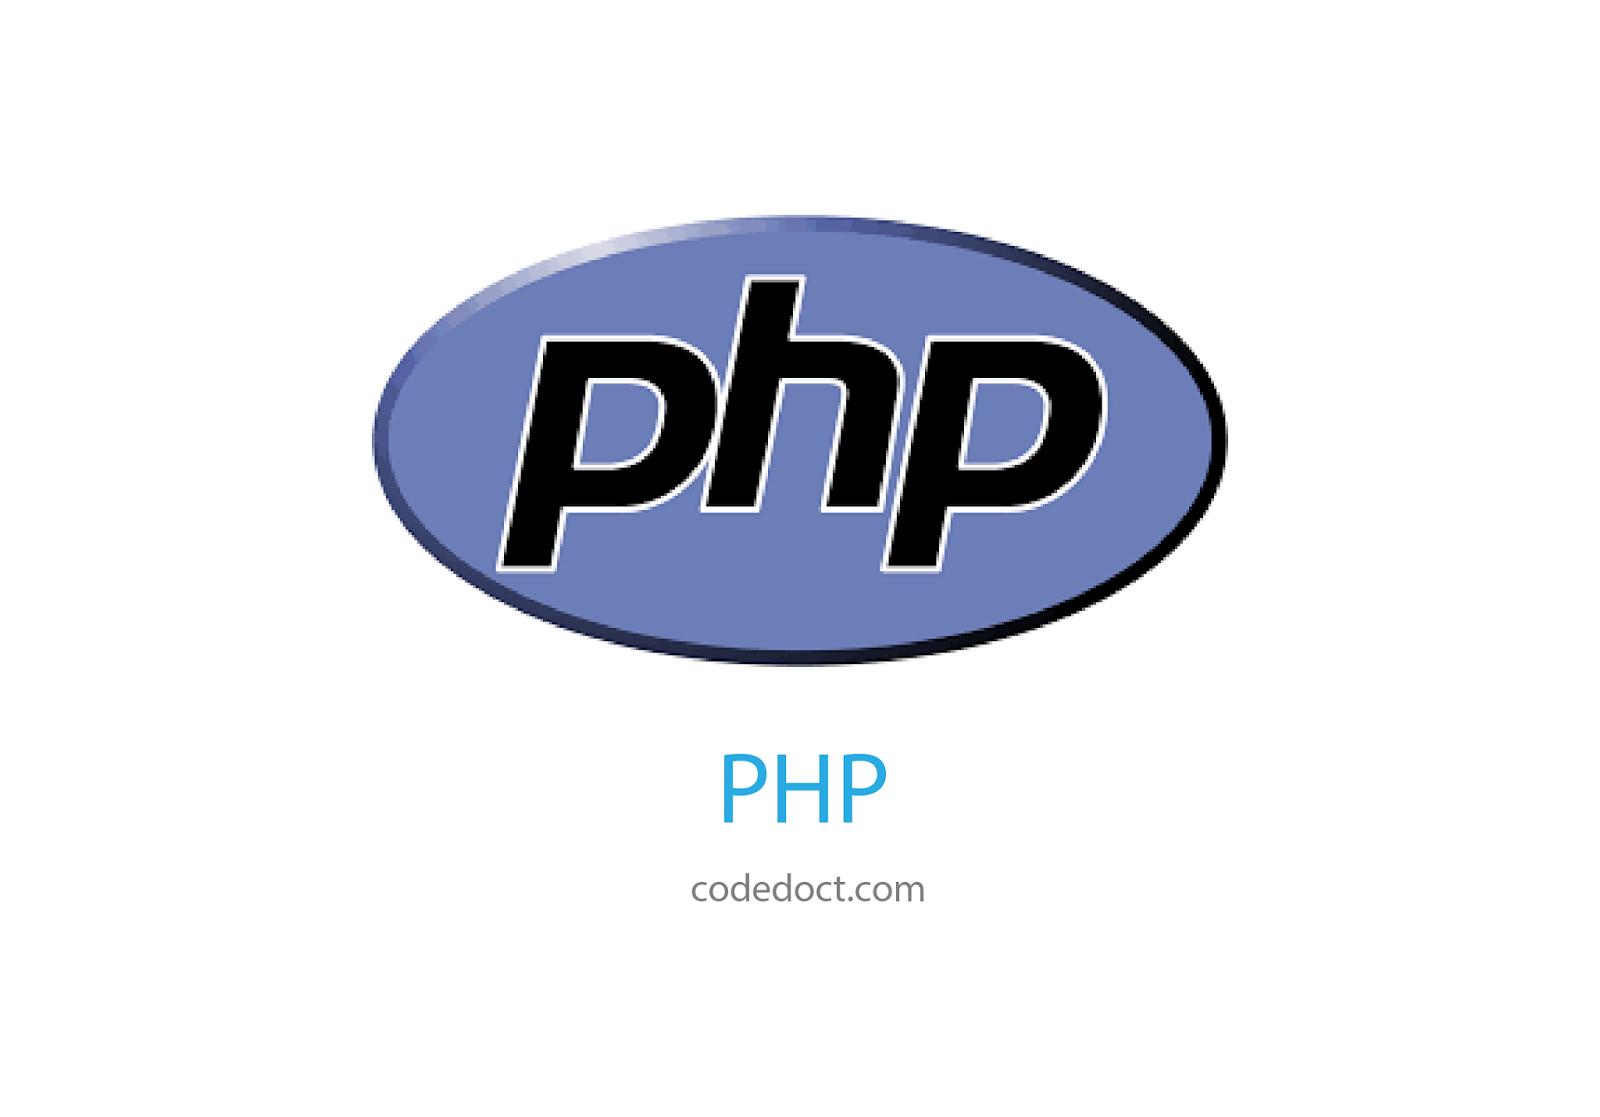 Tutorial programming: Website sederhana untuk pemula